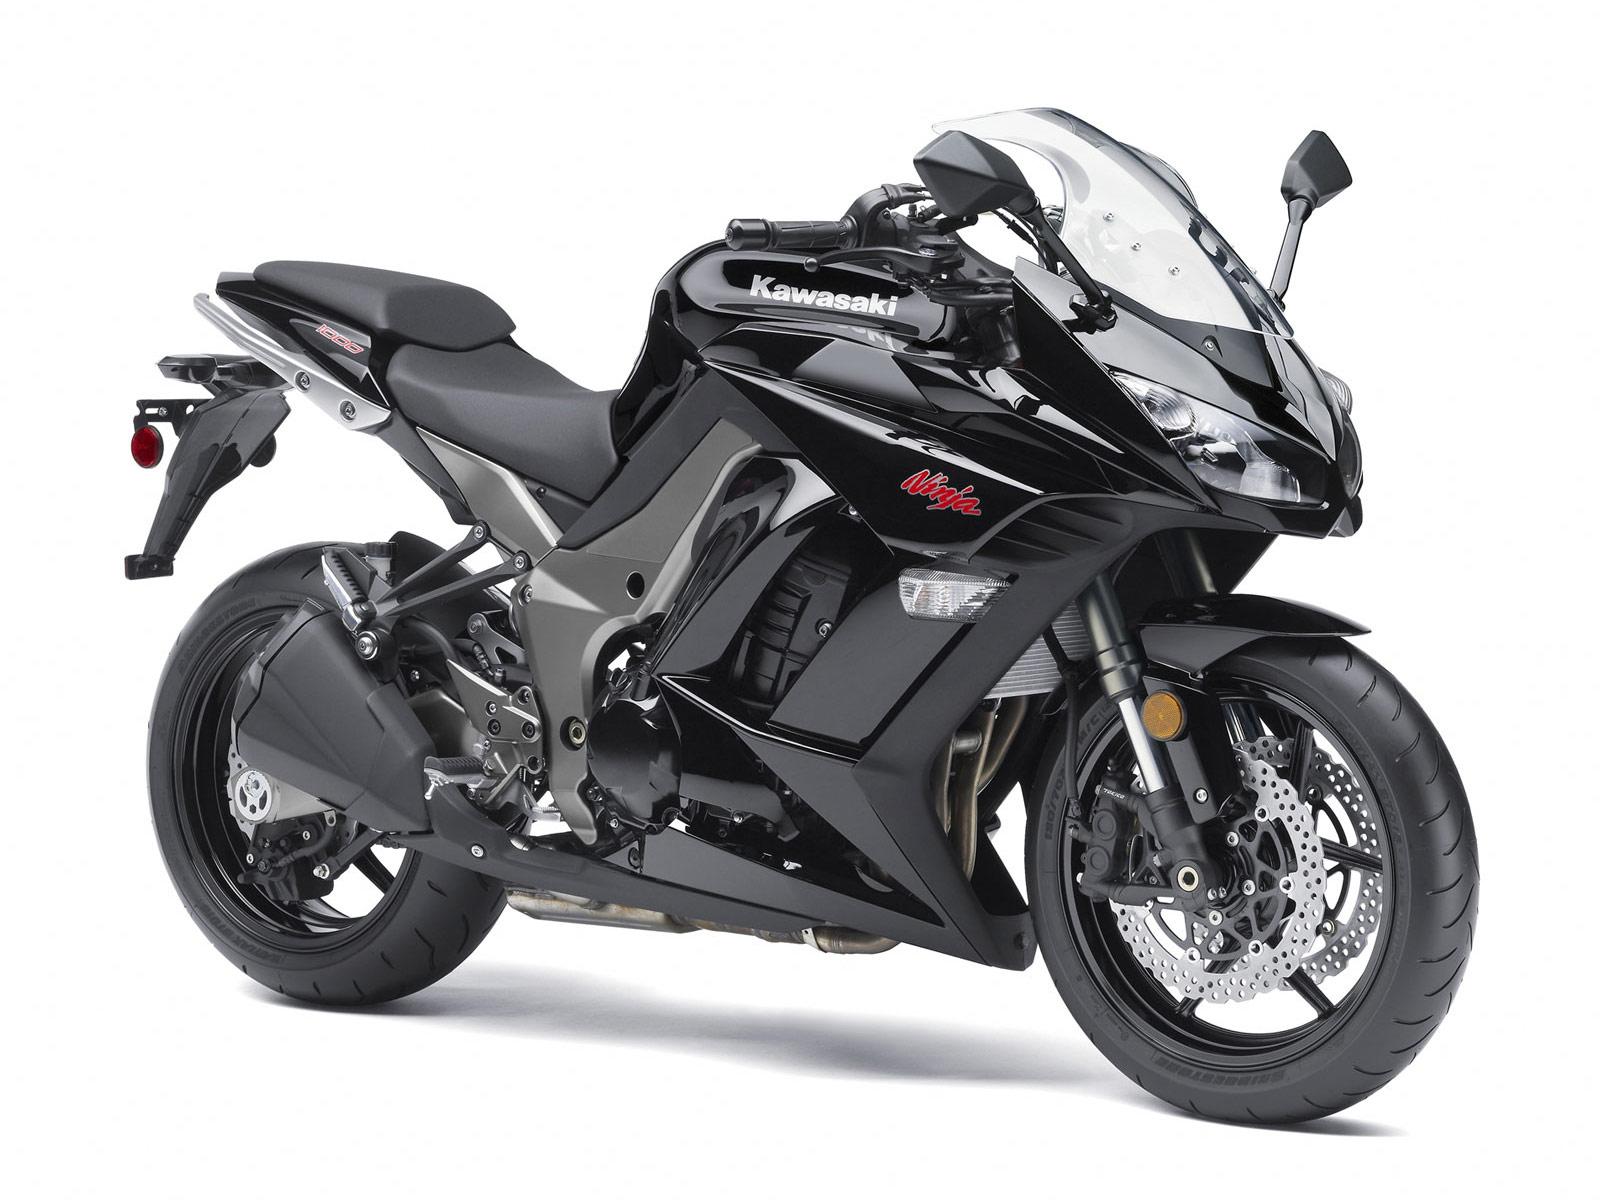 Kawasaki Ninja 1000 2011 Motorcycle Big Bike